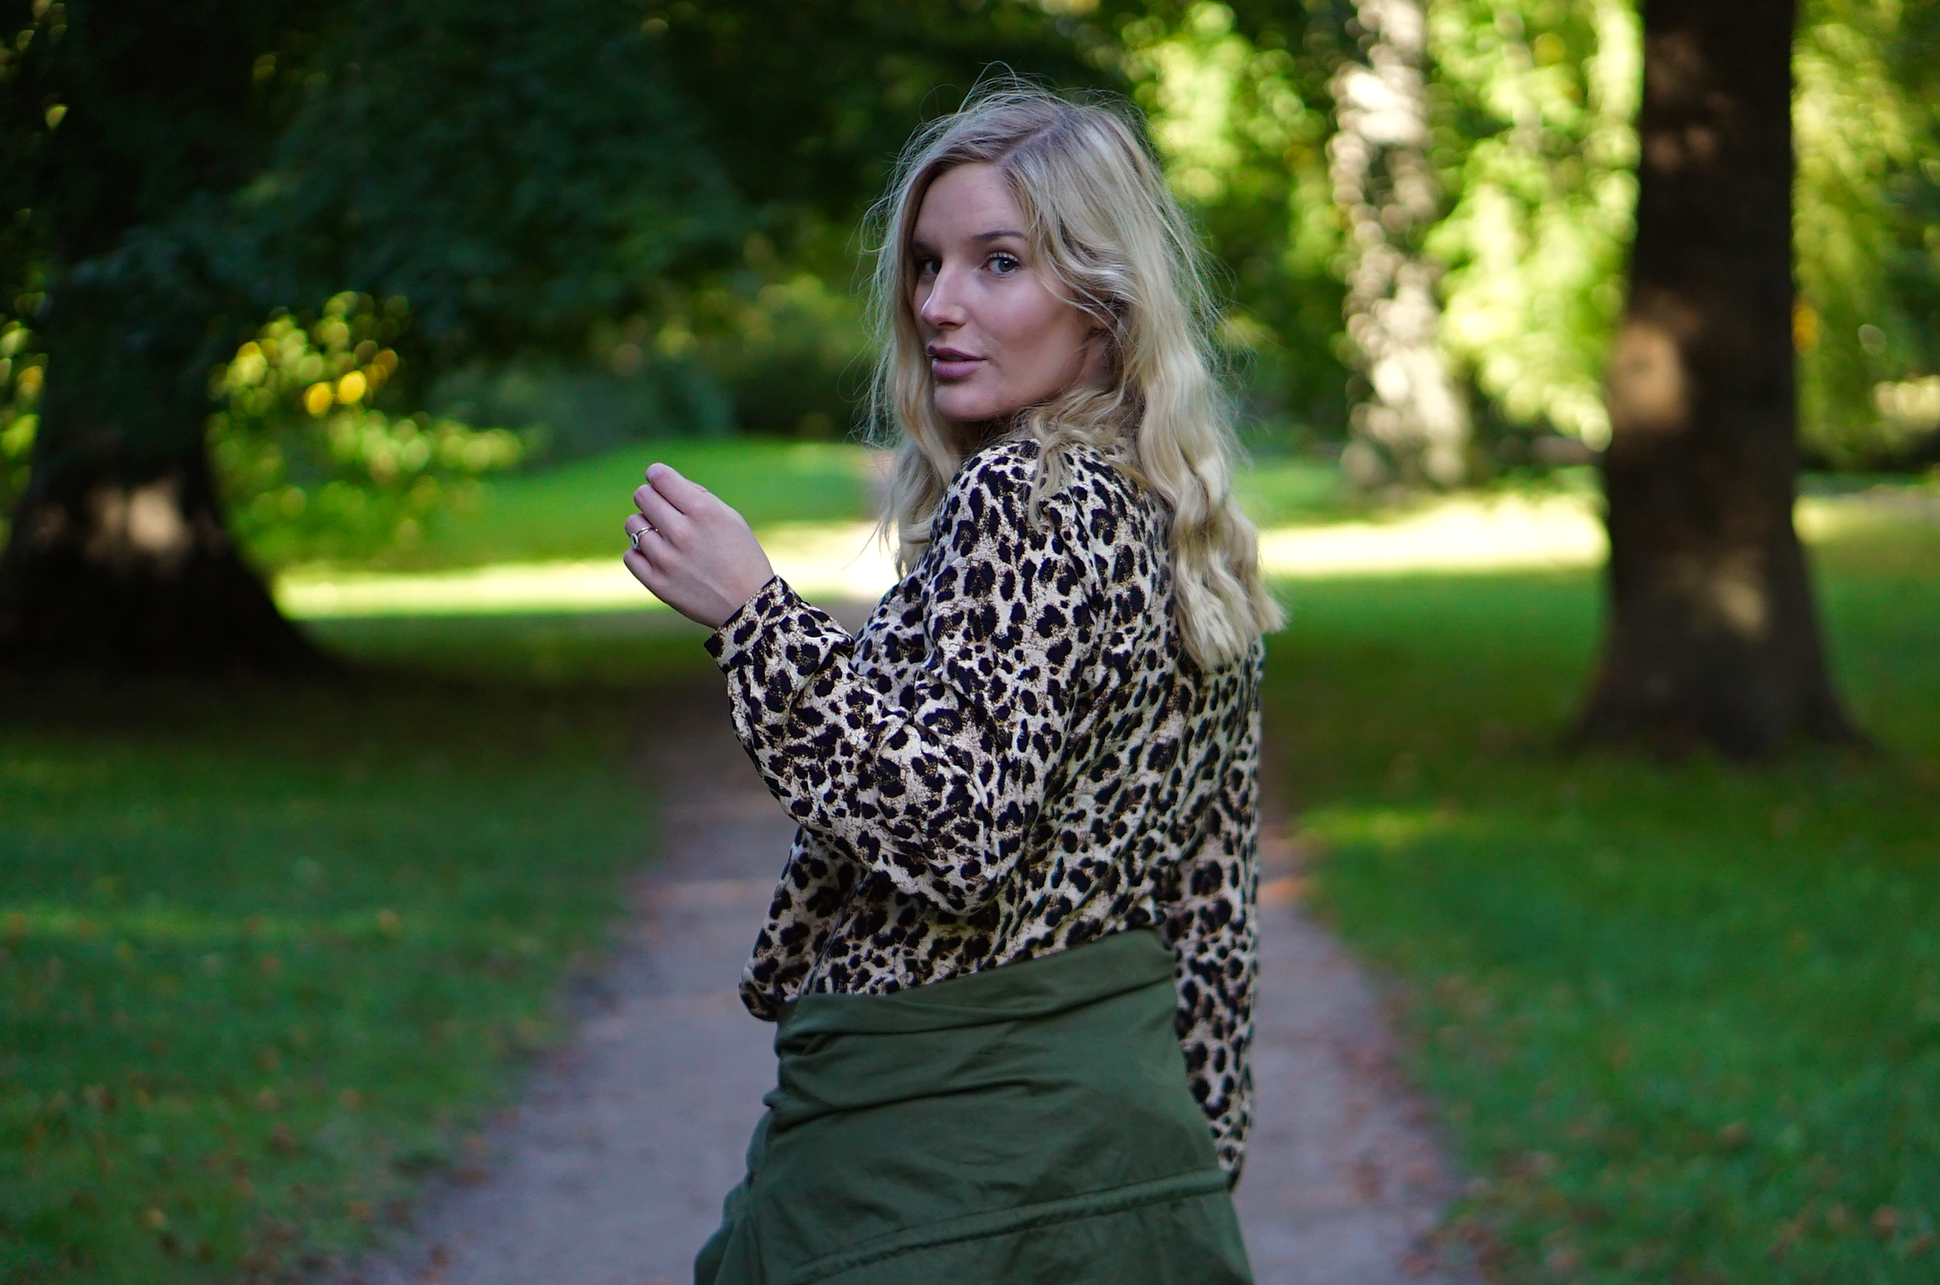 Autumn Calls for Leopard & Khaki